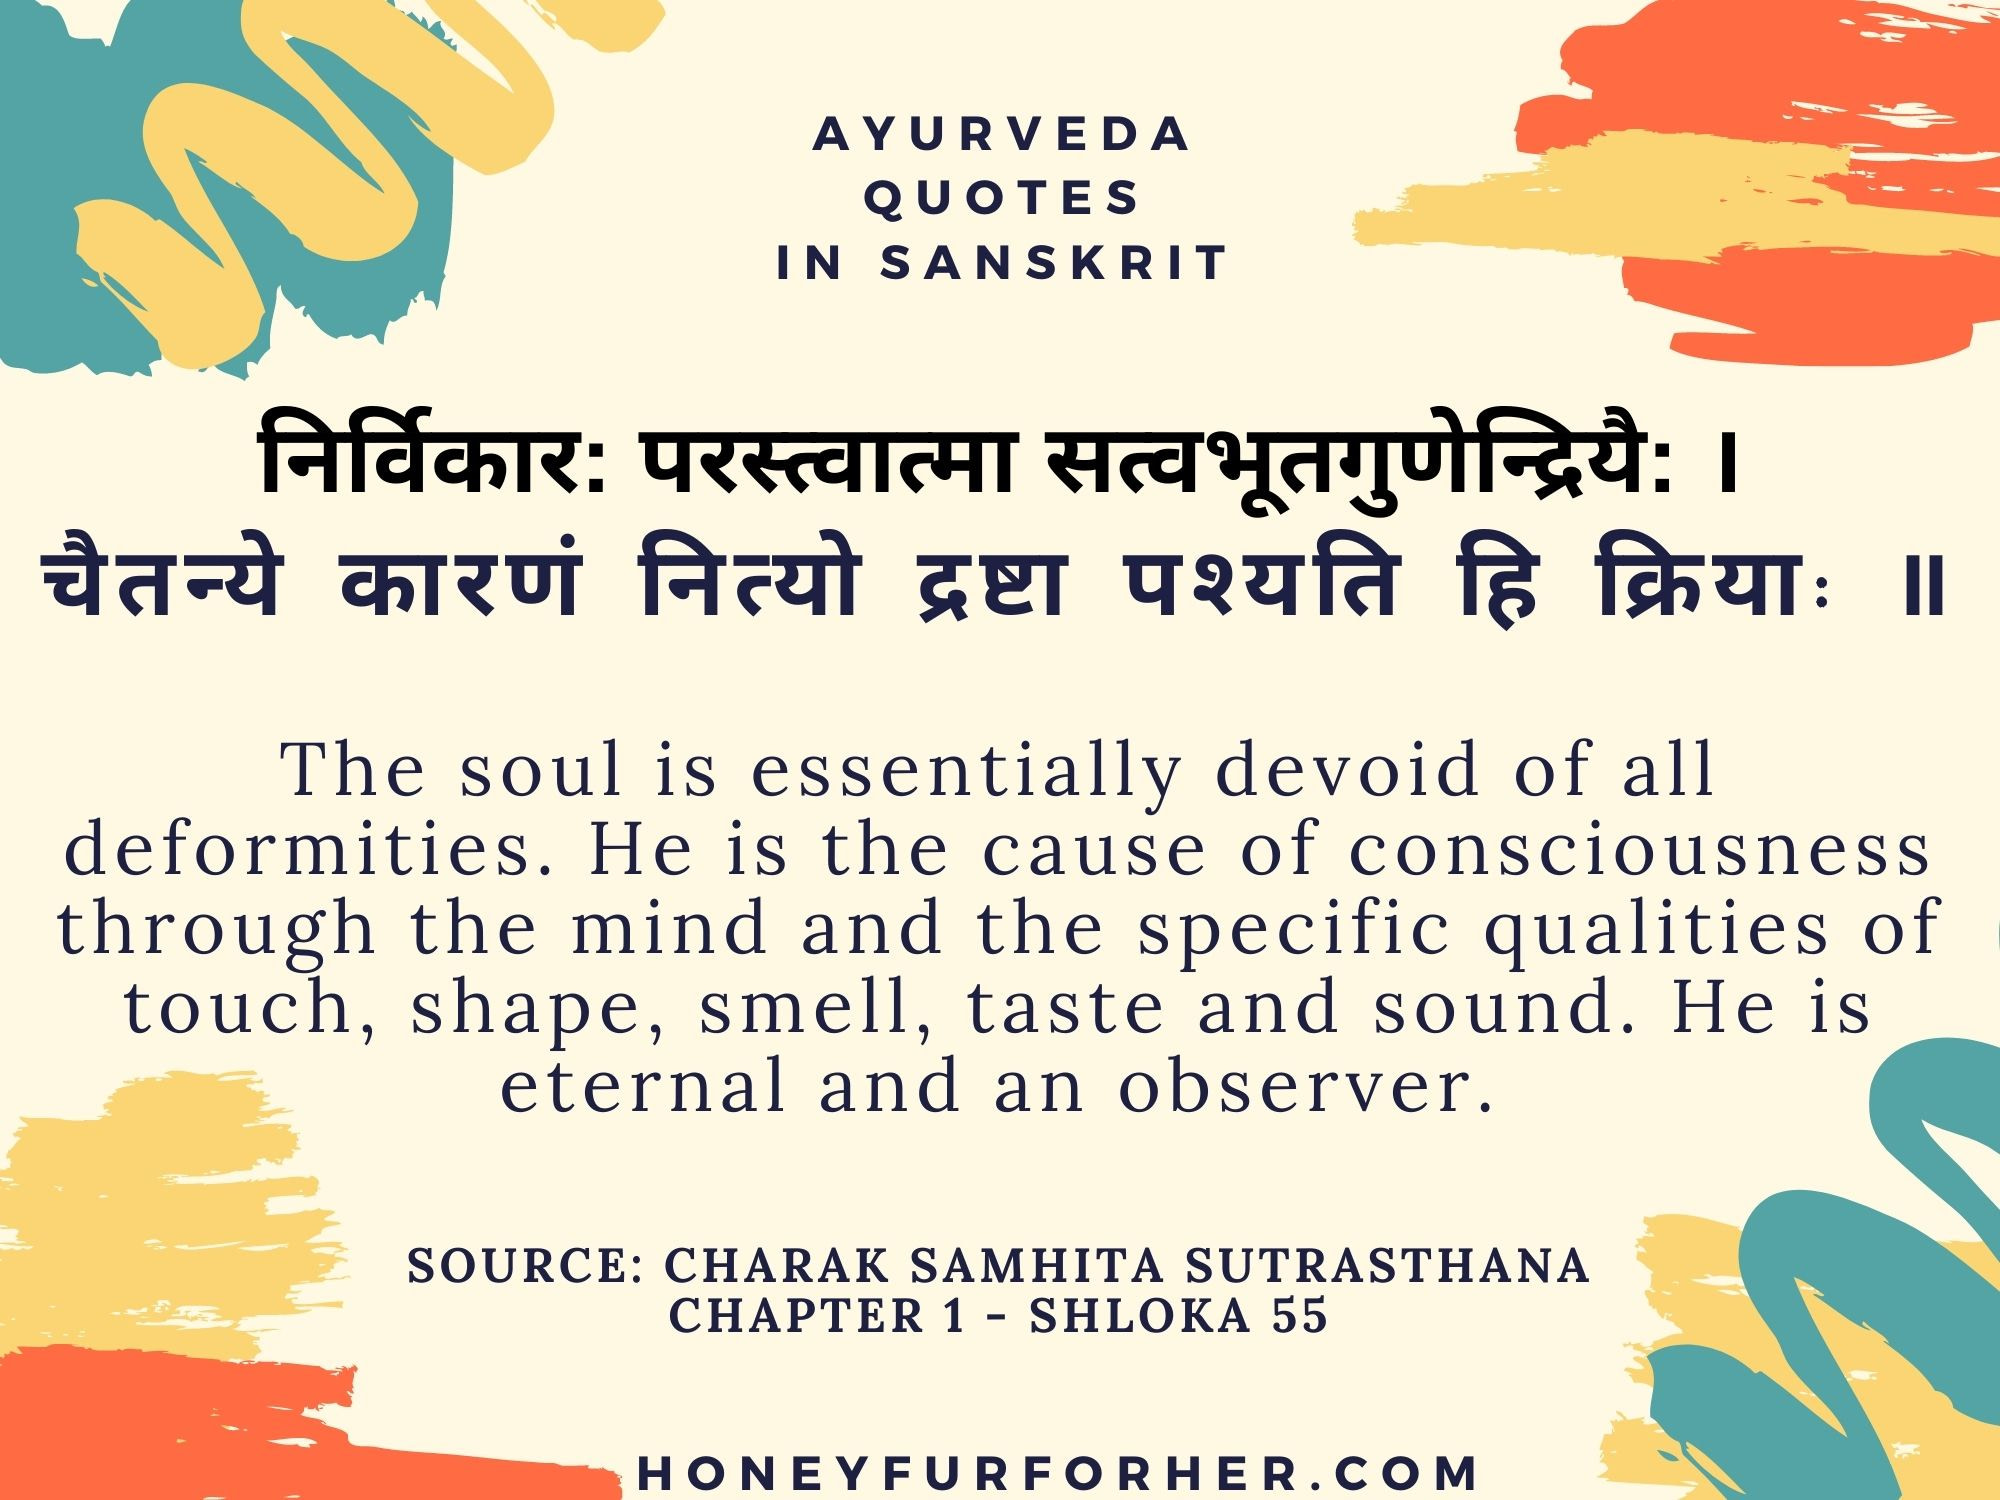 Ayurveda Quotes 03